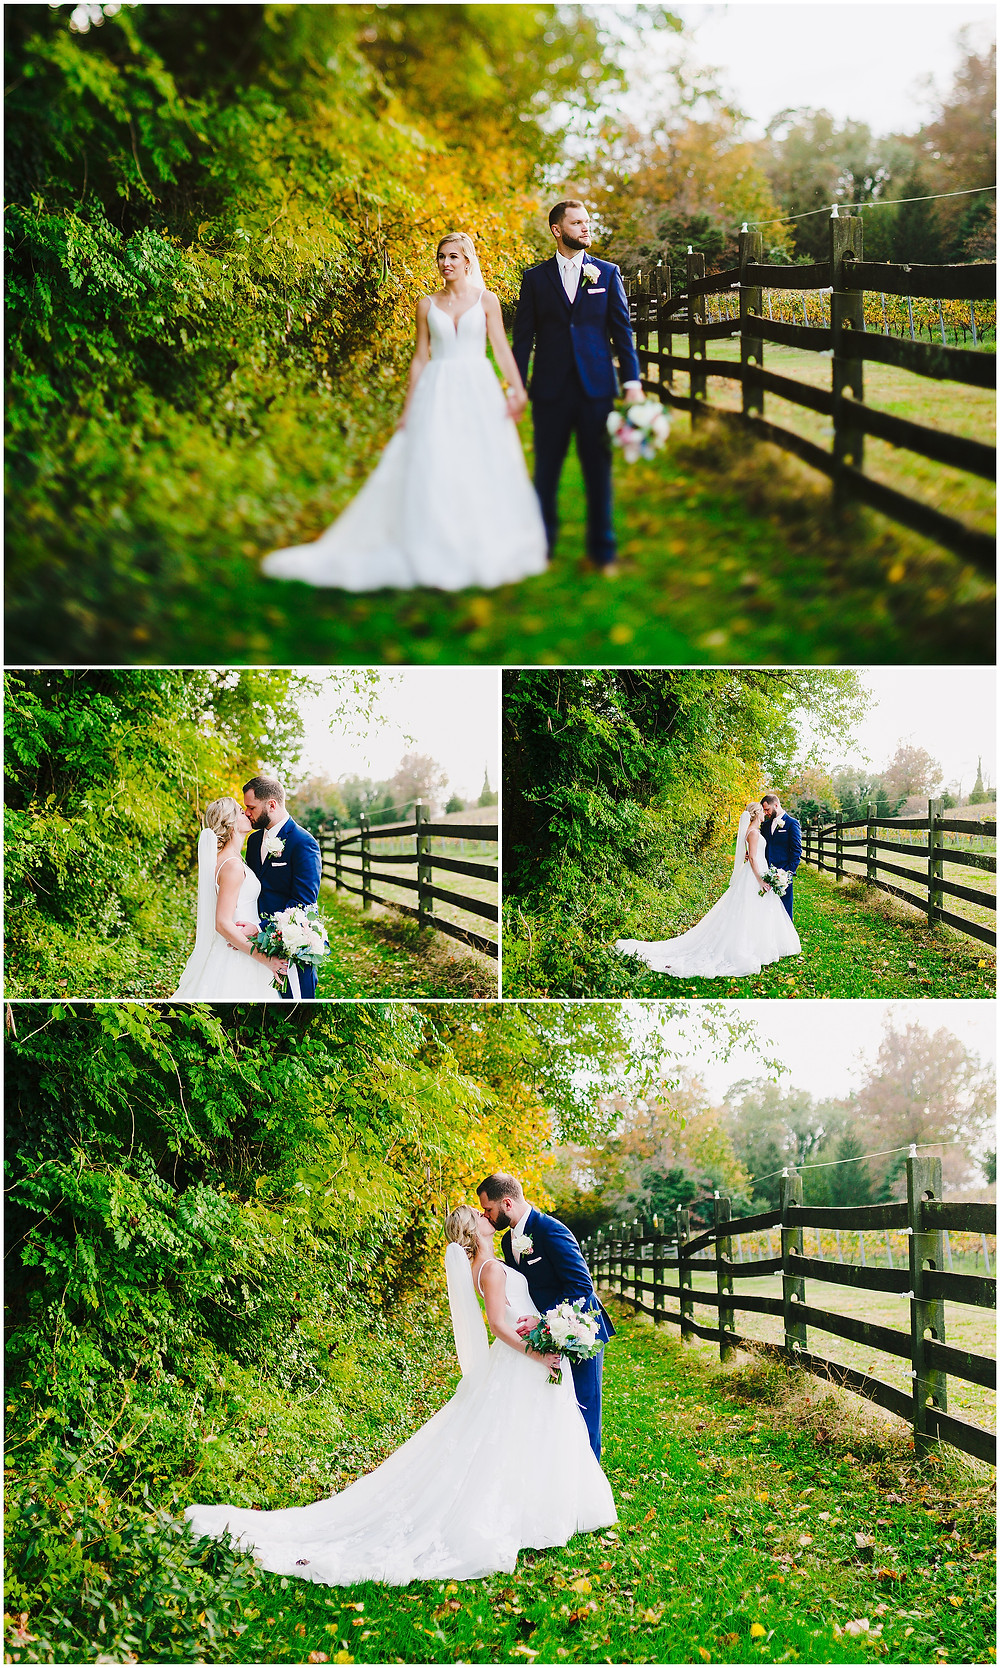 Sunset wedding portraits at Bohemia Overlook, Baltimore Wedding Photographer